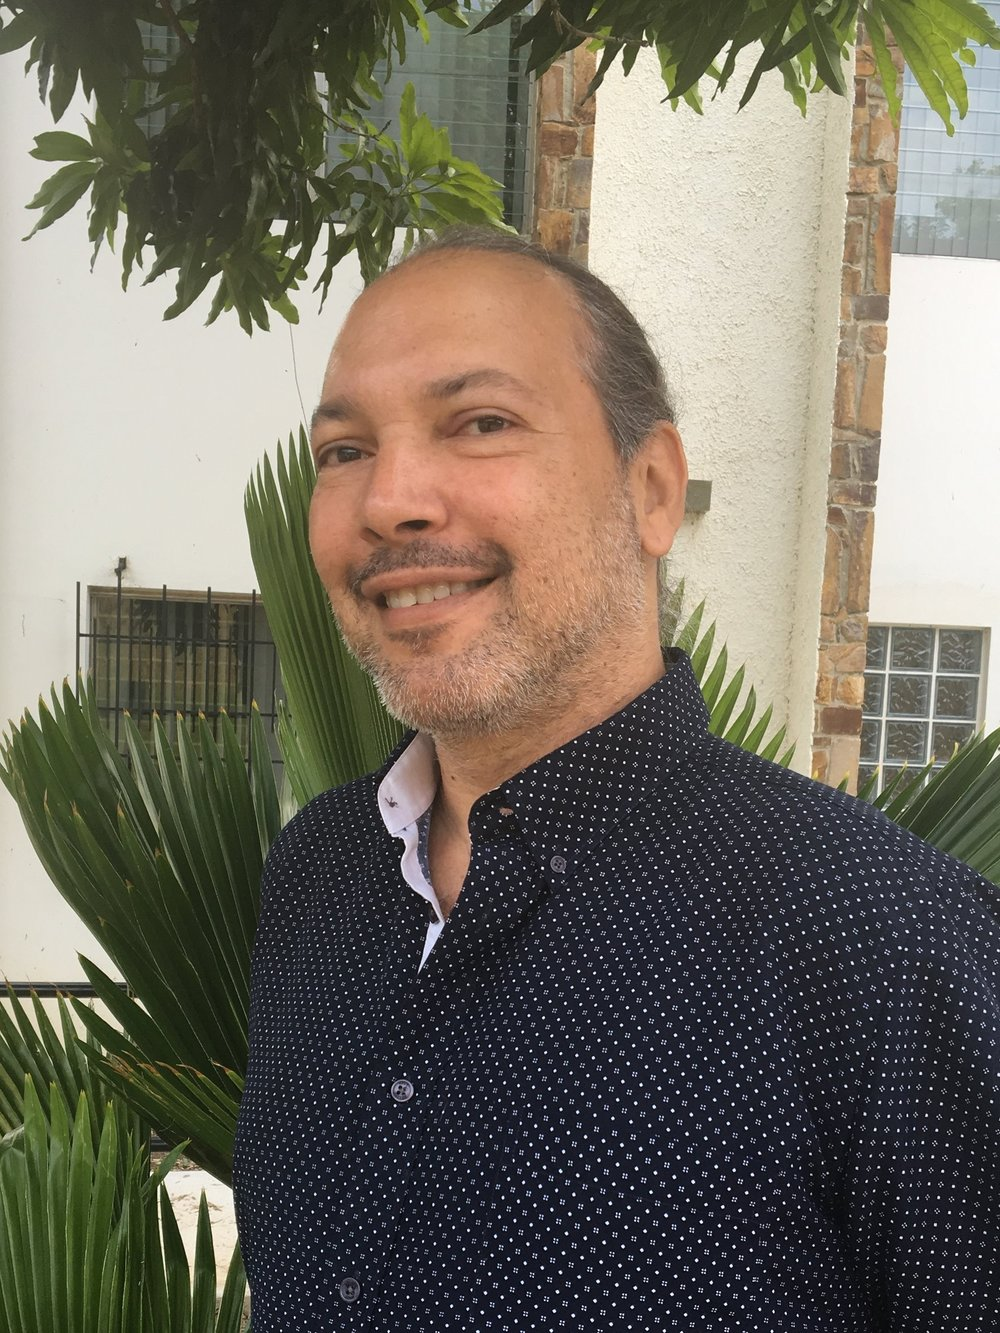 Edwin Cruz-Rivera, Associate Professor of Biology at the University of the Virgin Islands